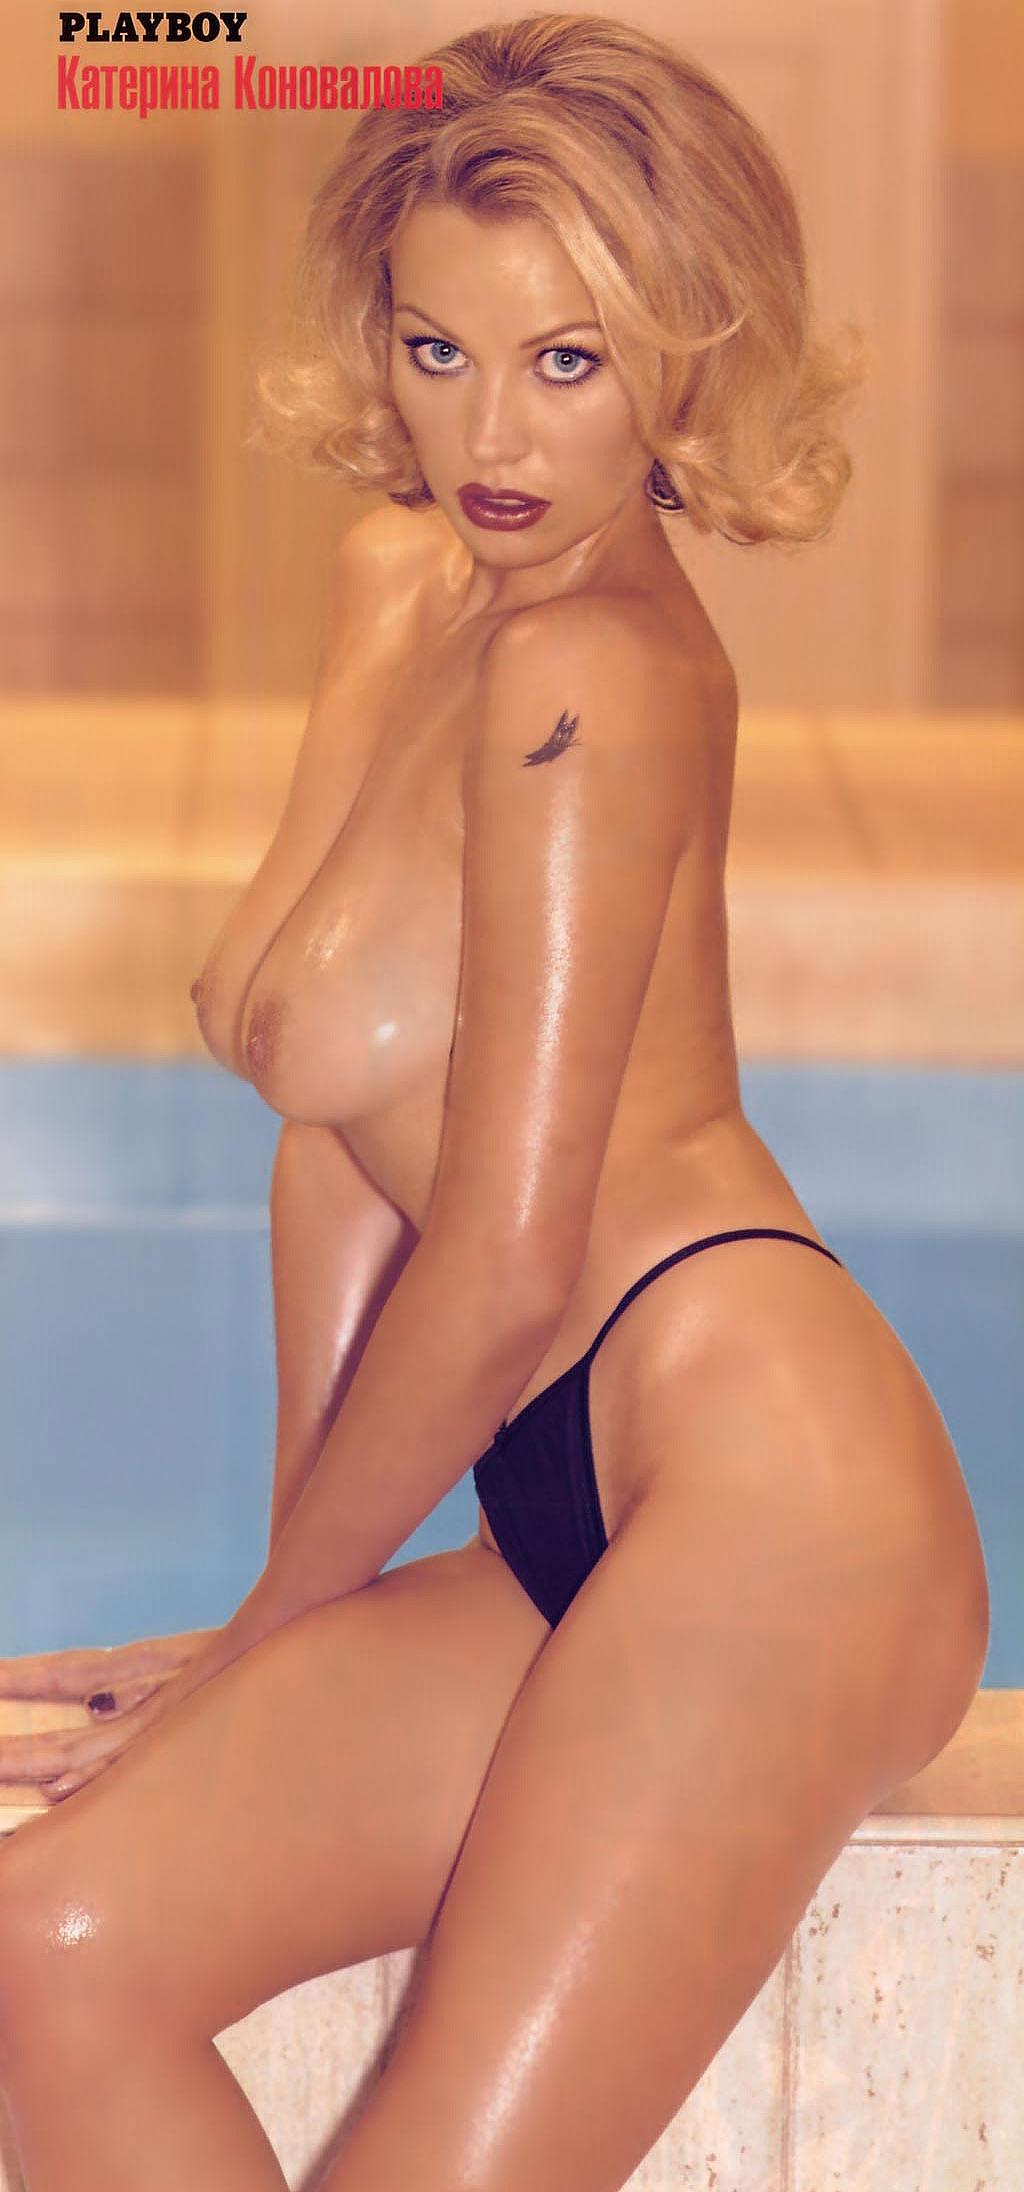 Фото порно актрисы катерина москва 8 фотография